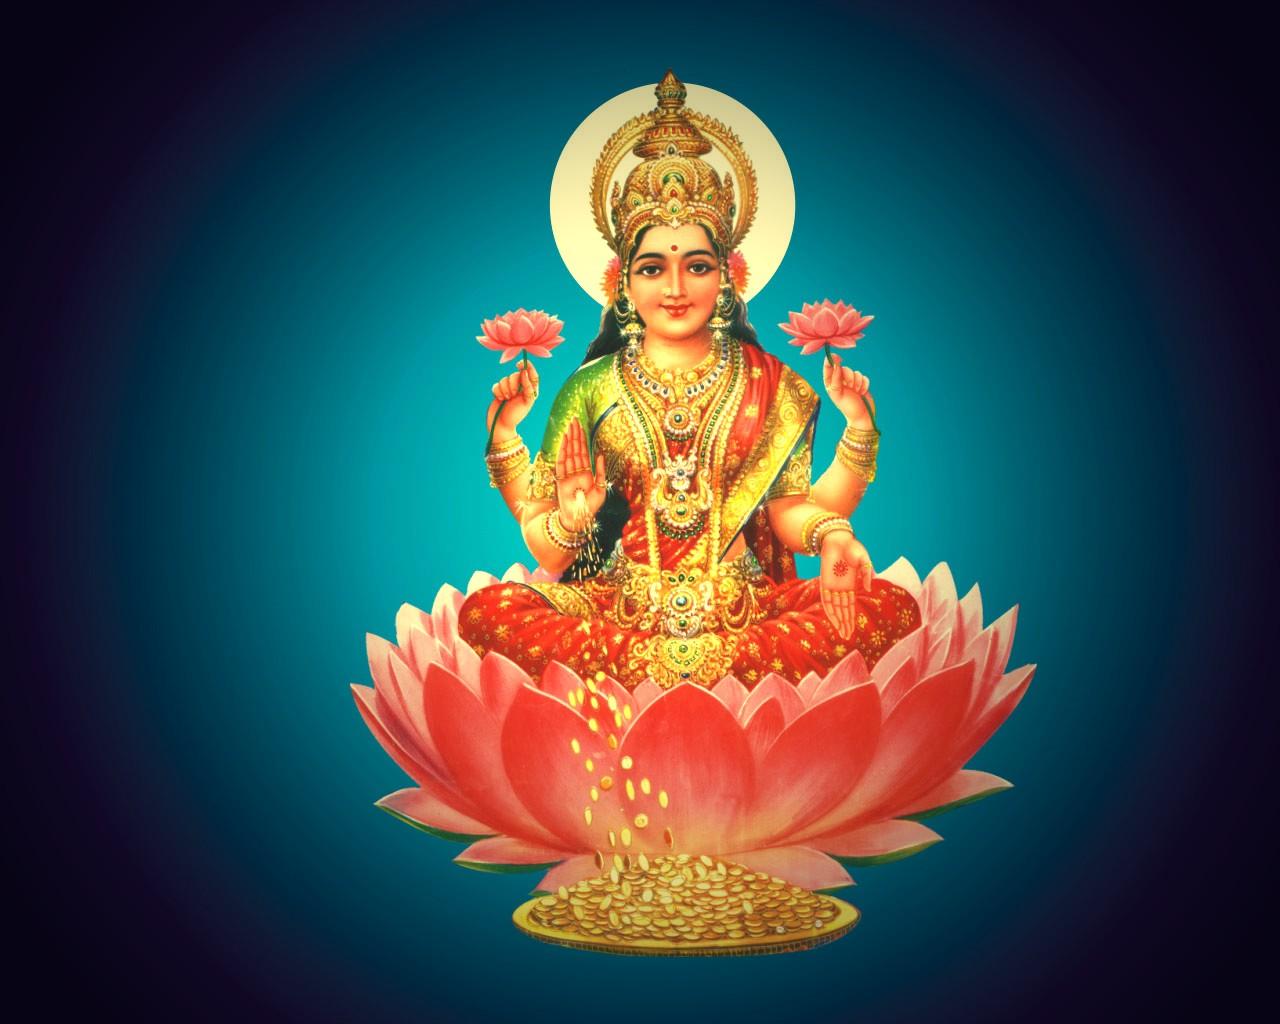 All Wallpaper Download Images of Lakshmi 1280x1024